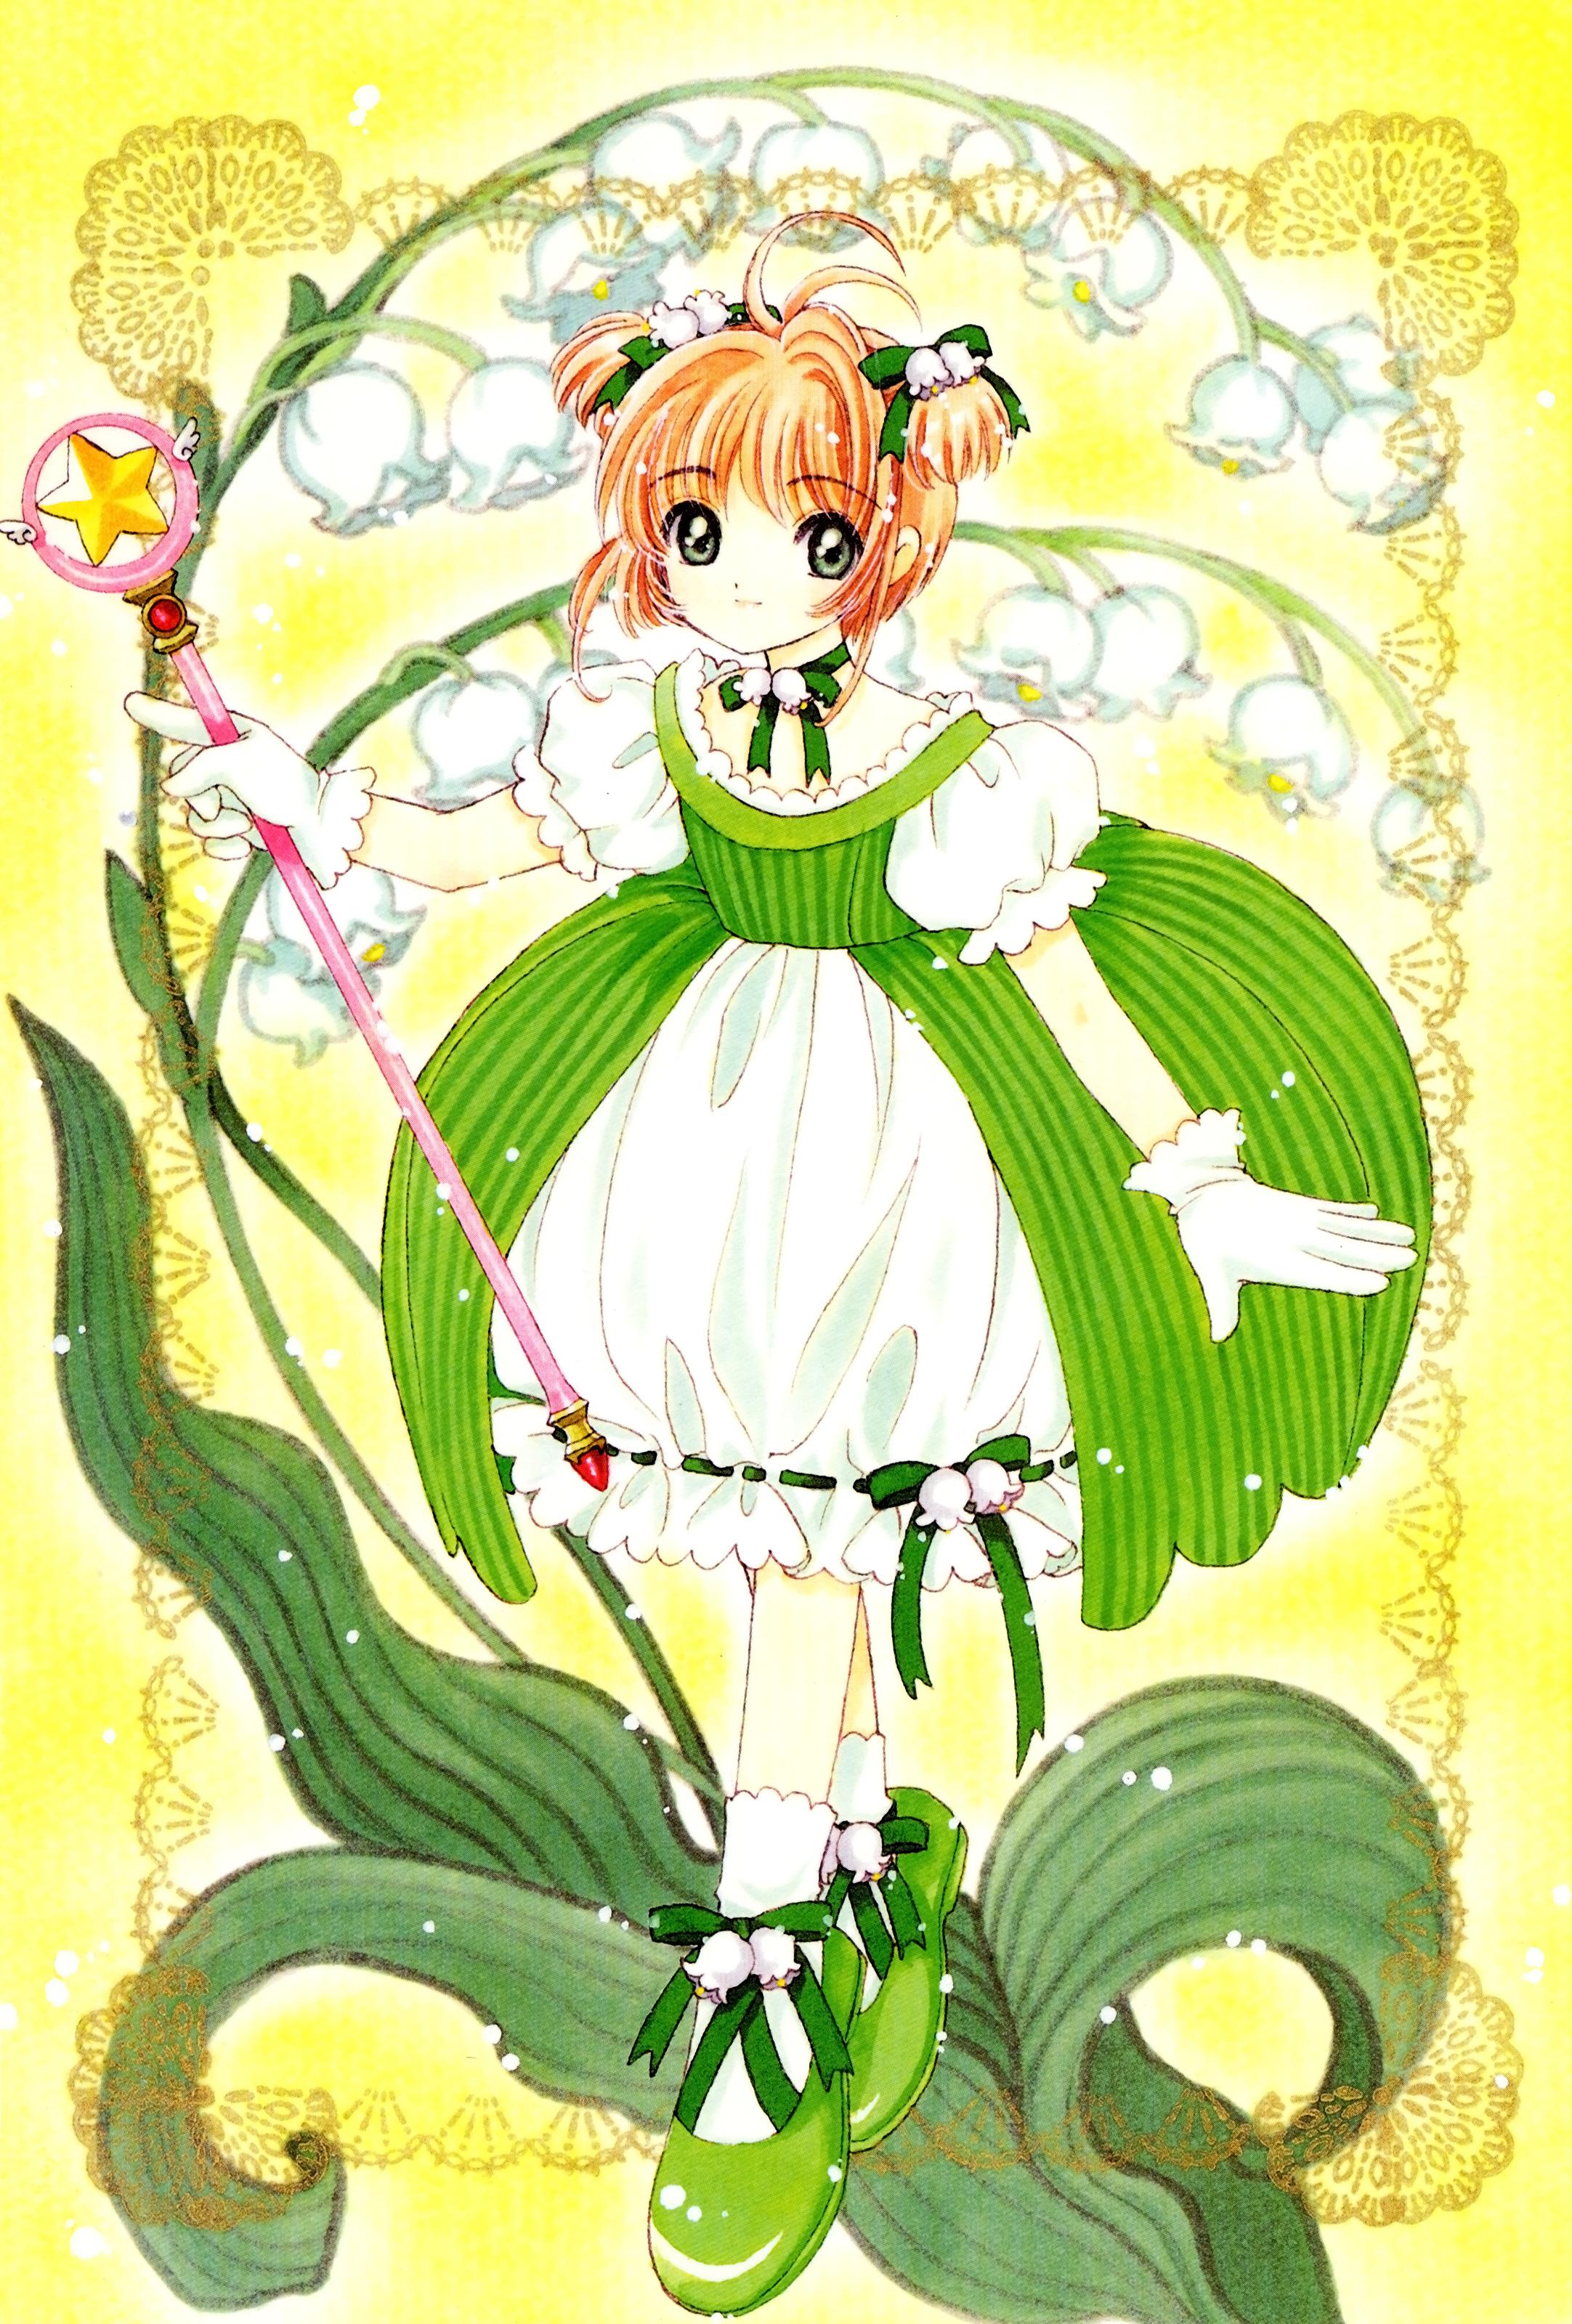 Sakura card captor 34 la luna llena de mediodiacutea - 4 2